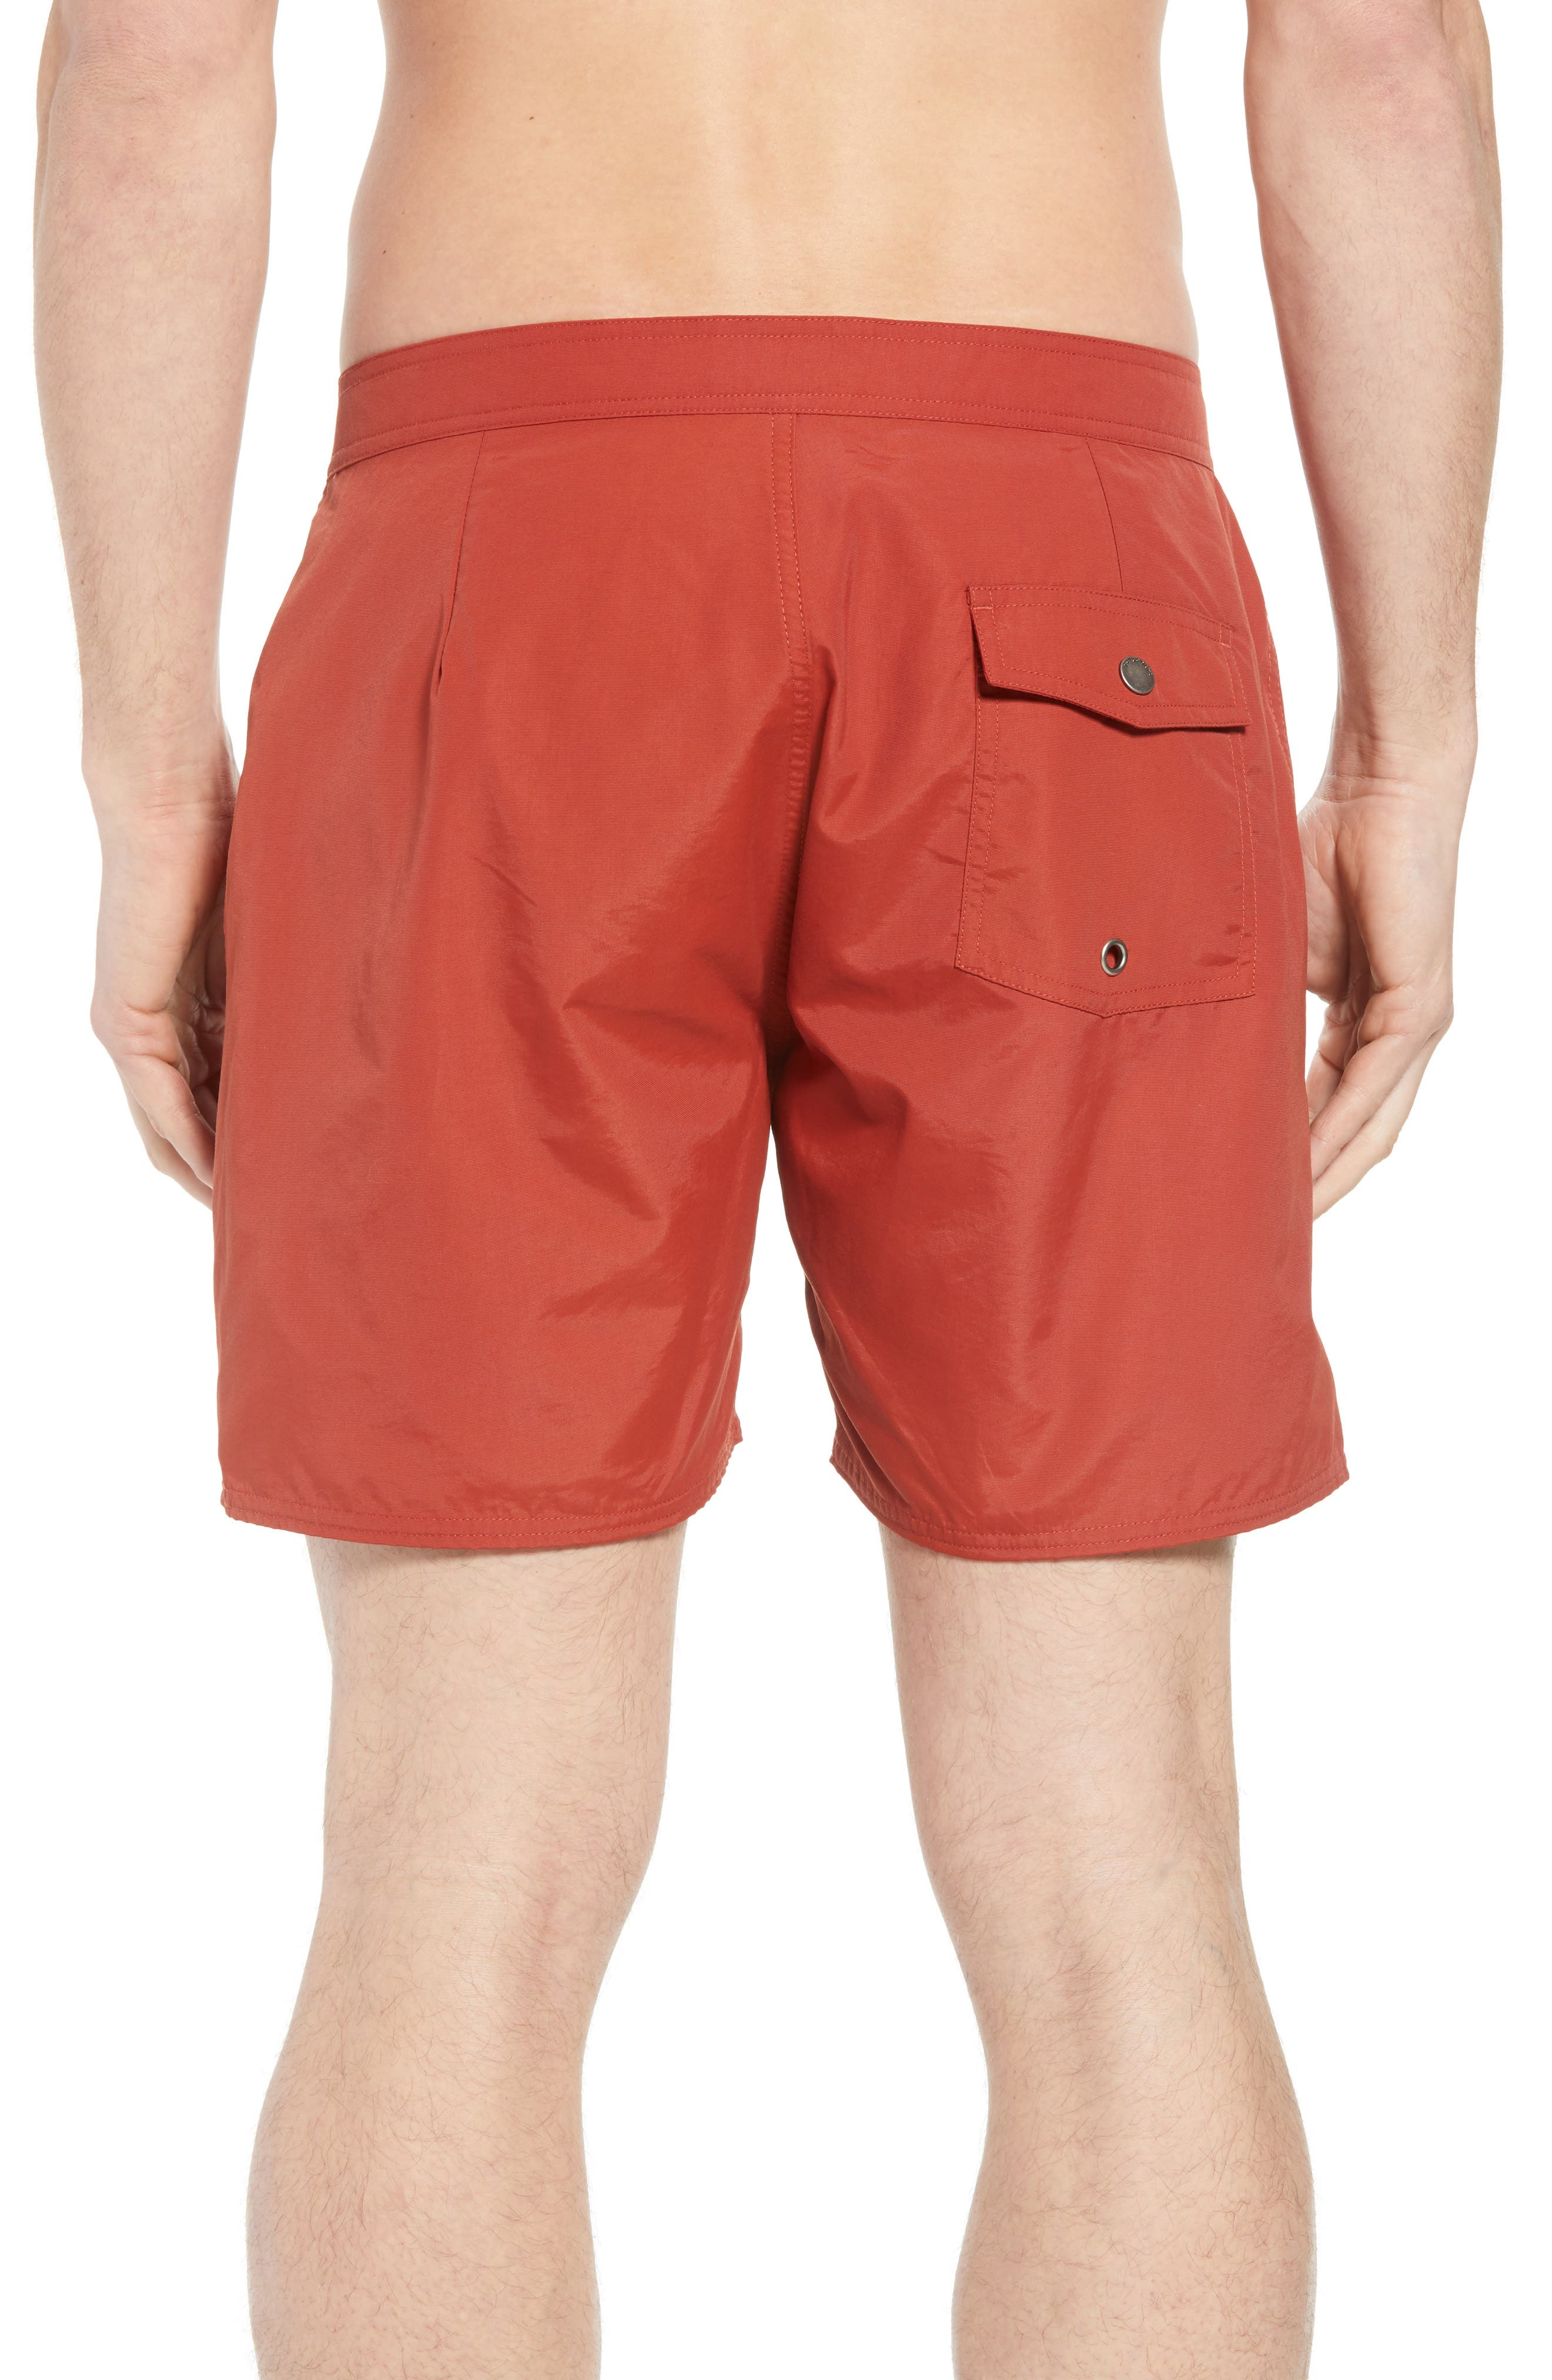 Colin Board Shorts,                             Alternate thumbnail 2, color,                             600